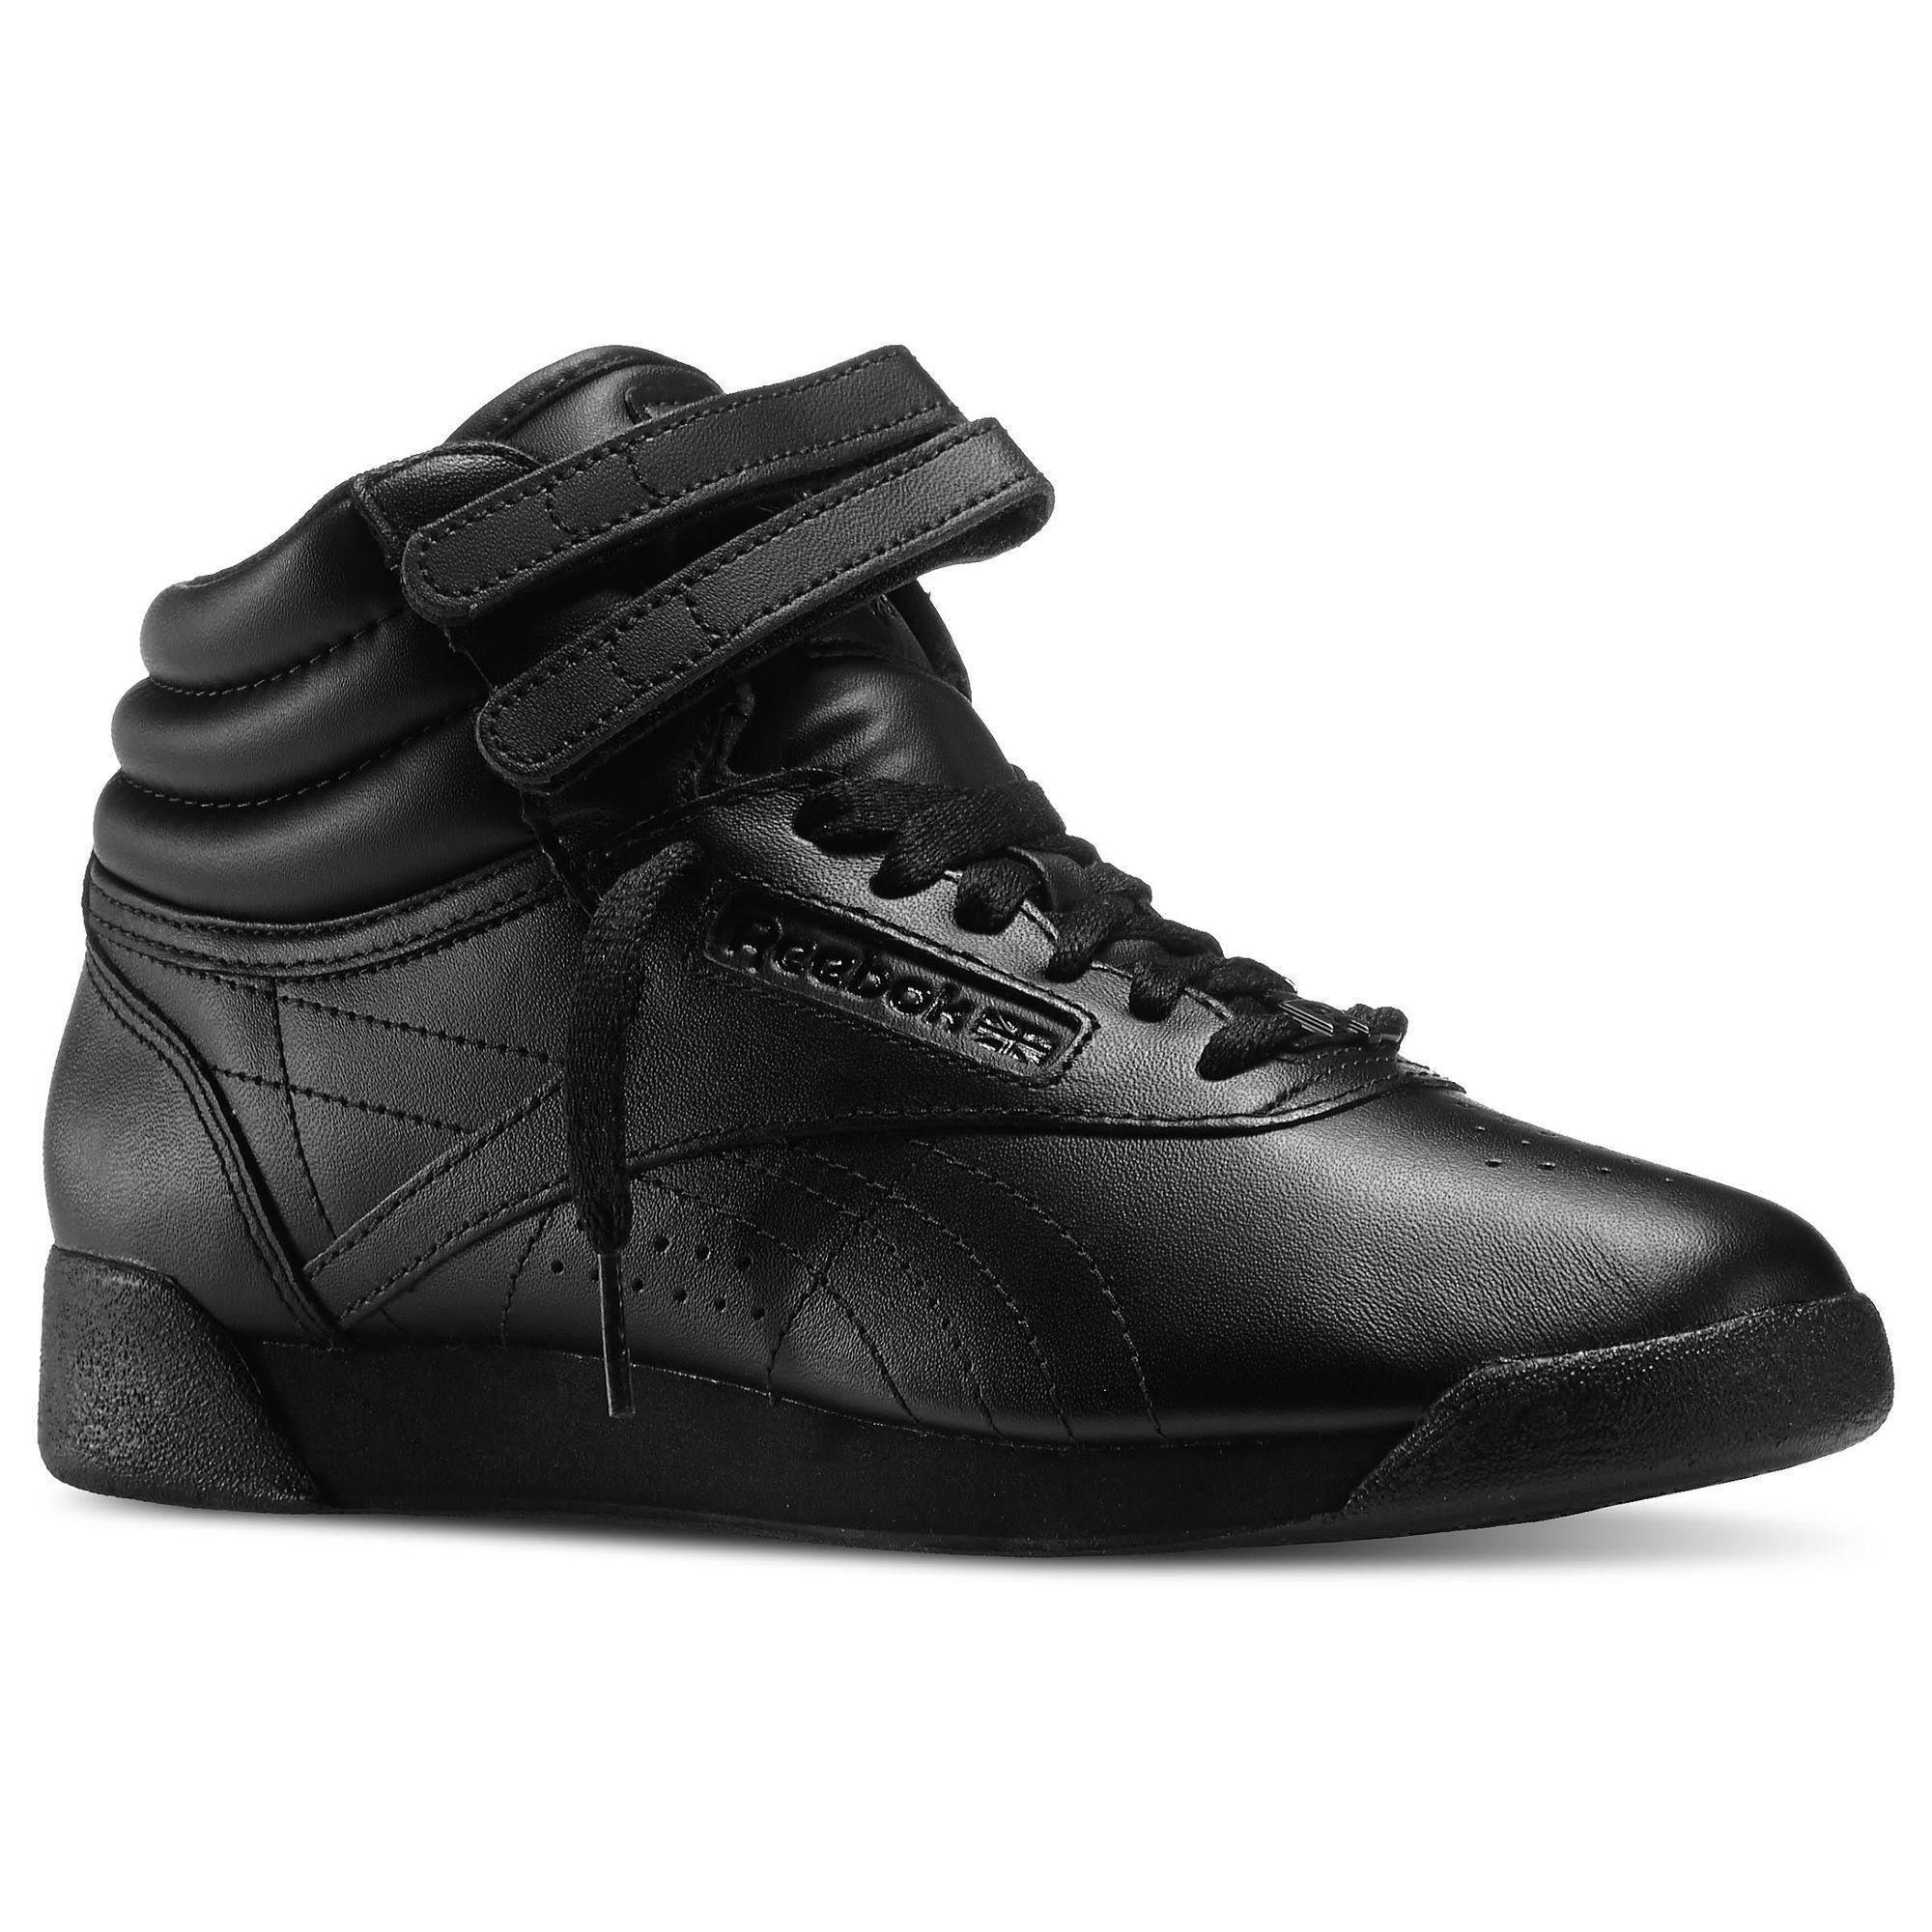 J92633 Style Life Womens Reebok Zapatillas 7 Black Talla Freestyle Hi 4wH1Y0q